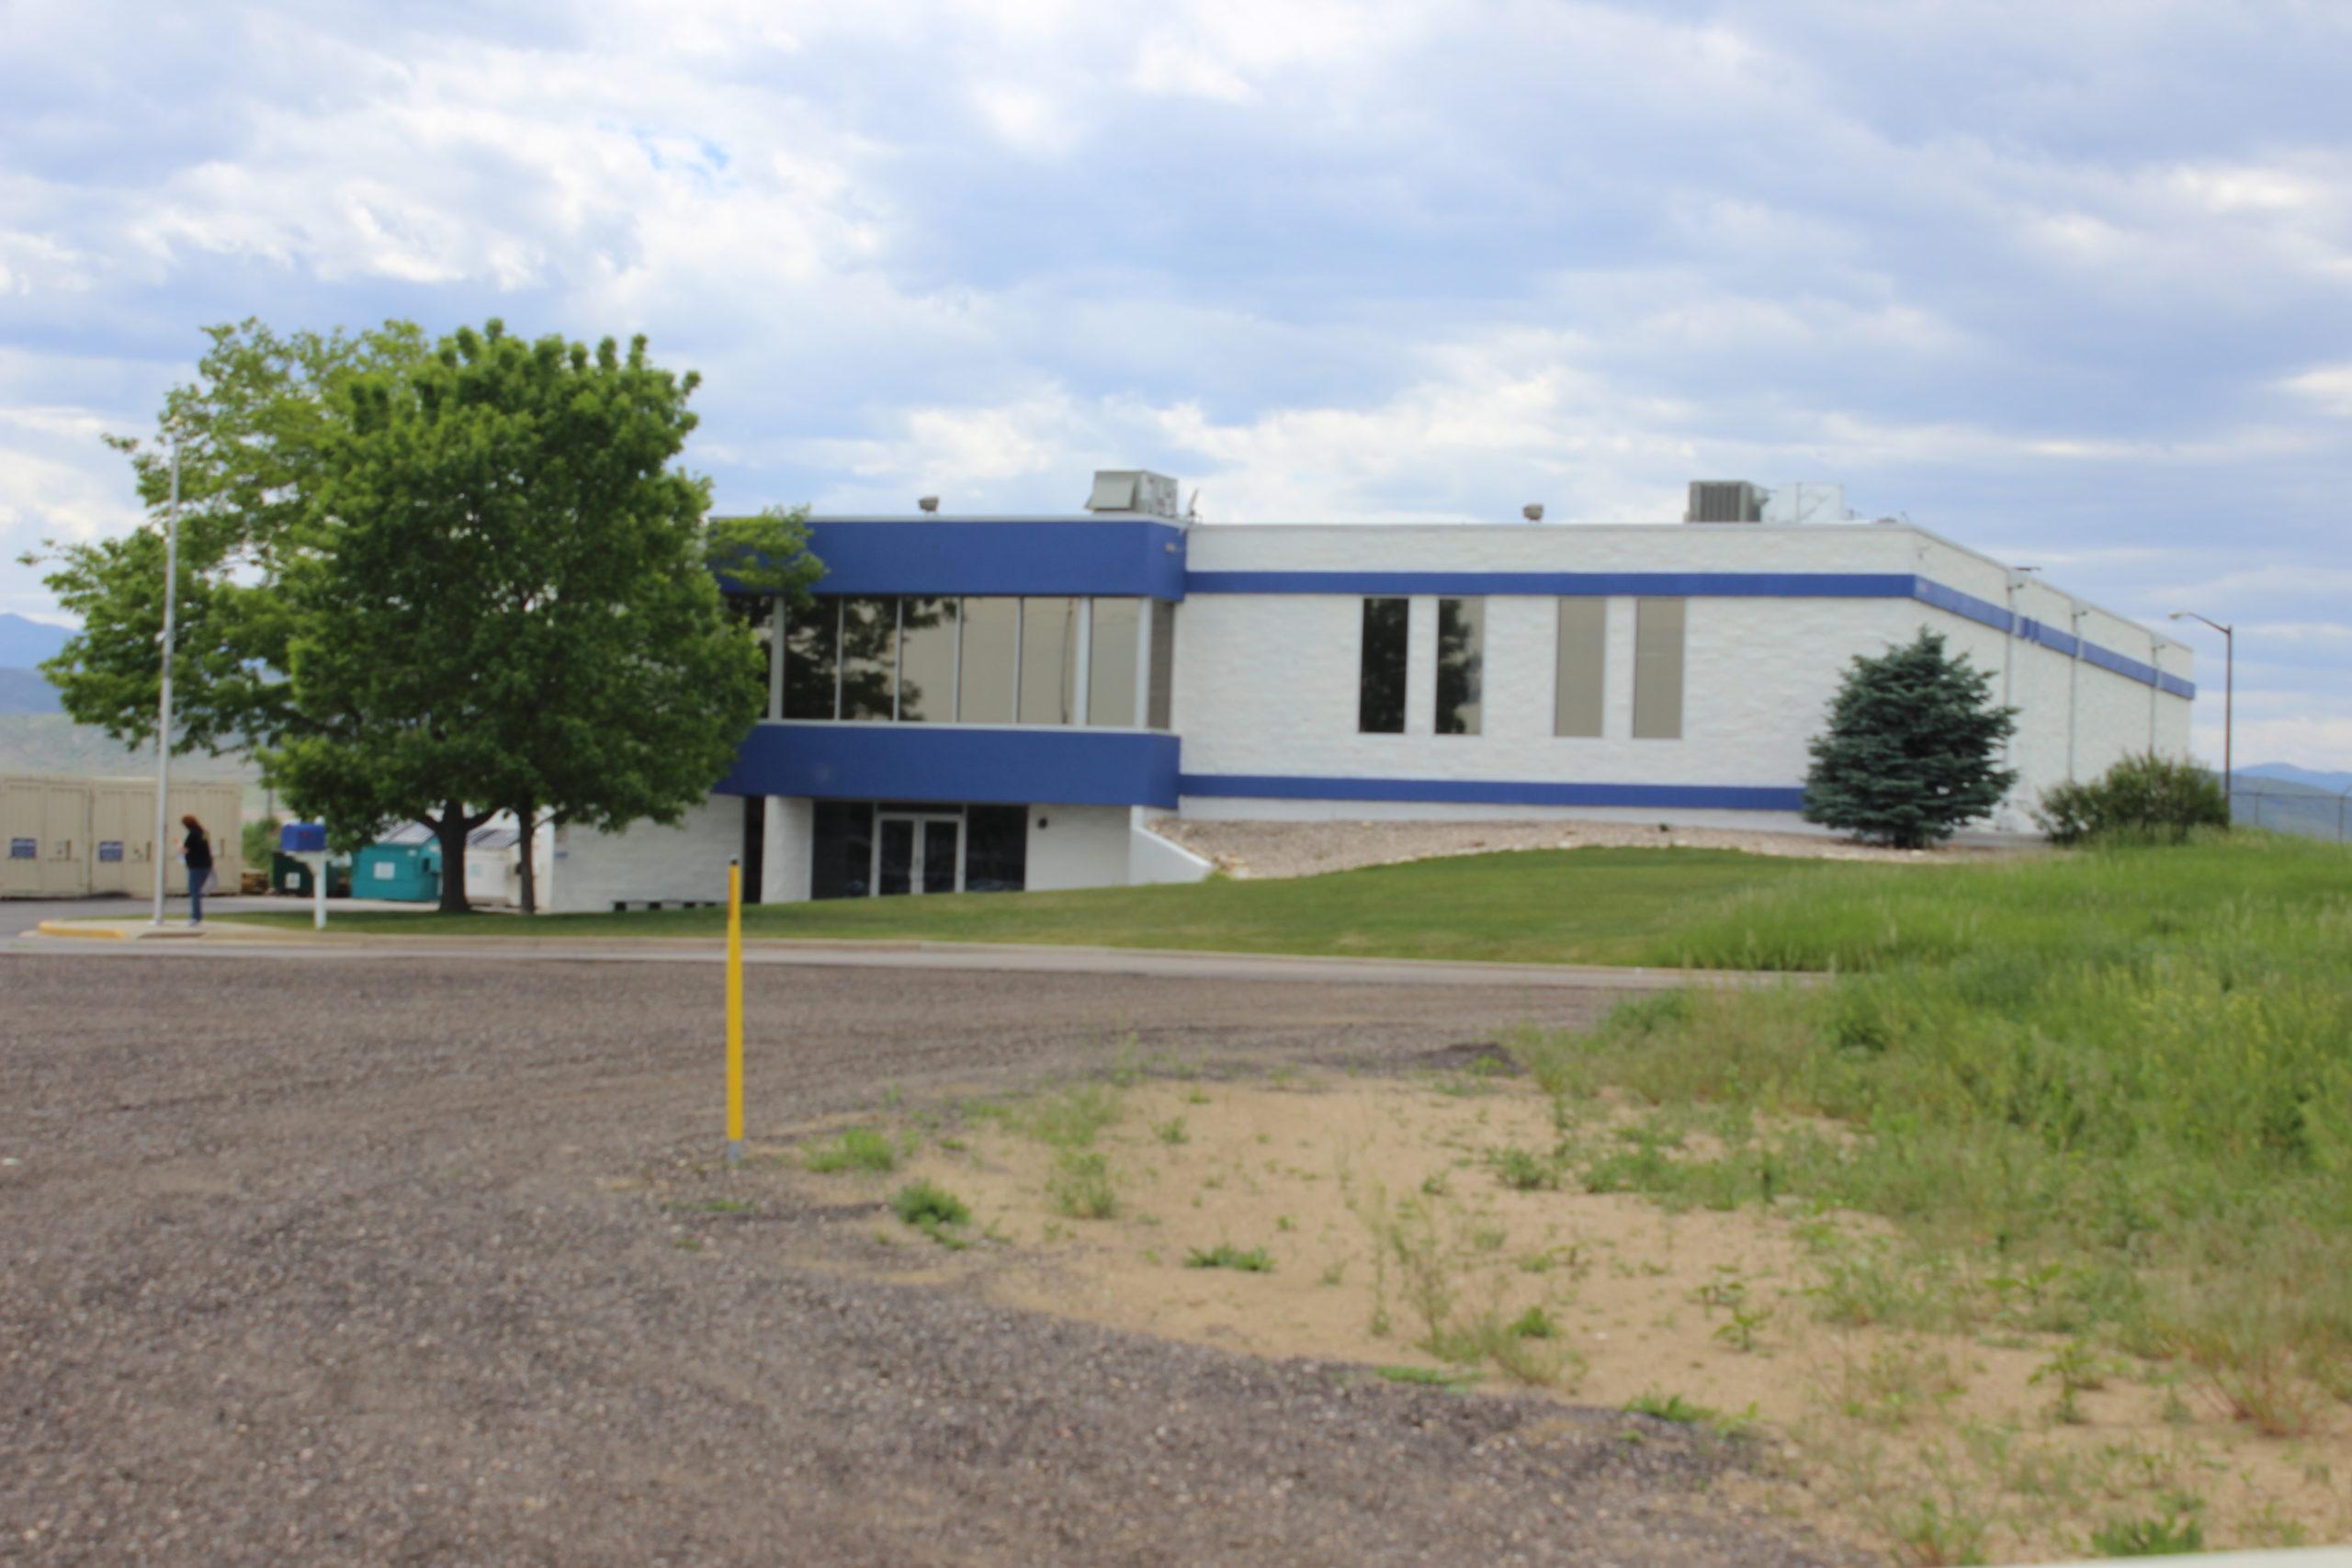 LulzBot Factory